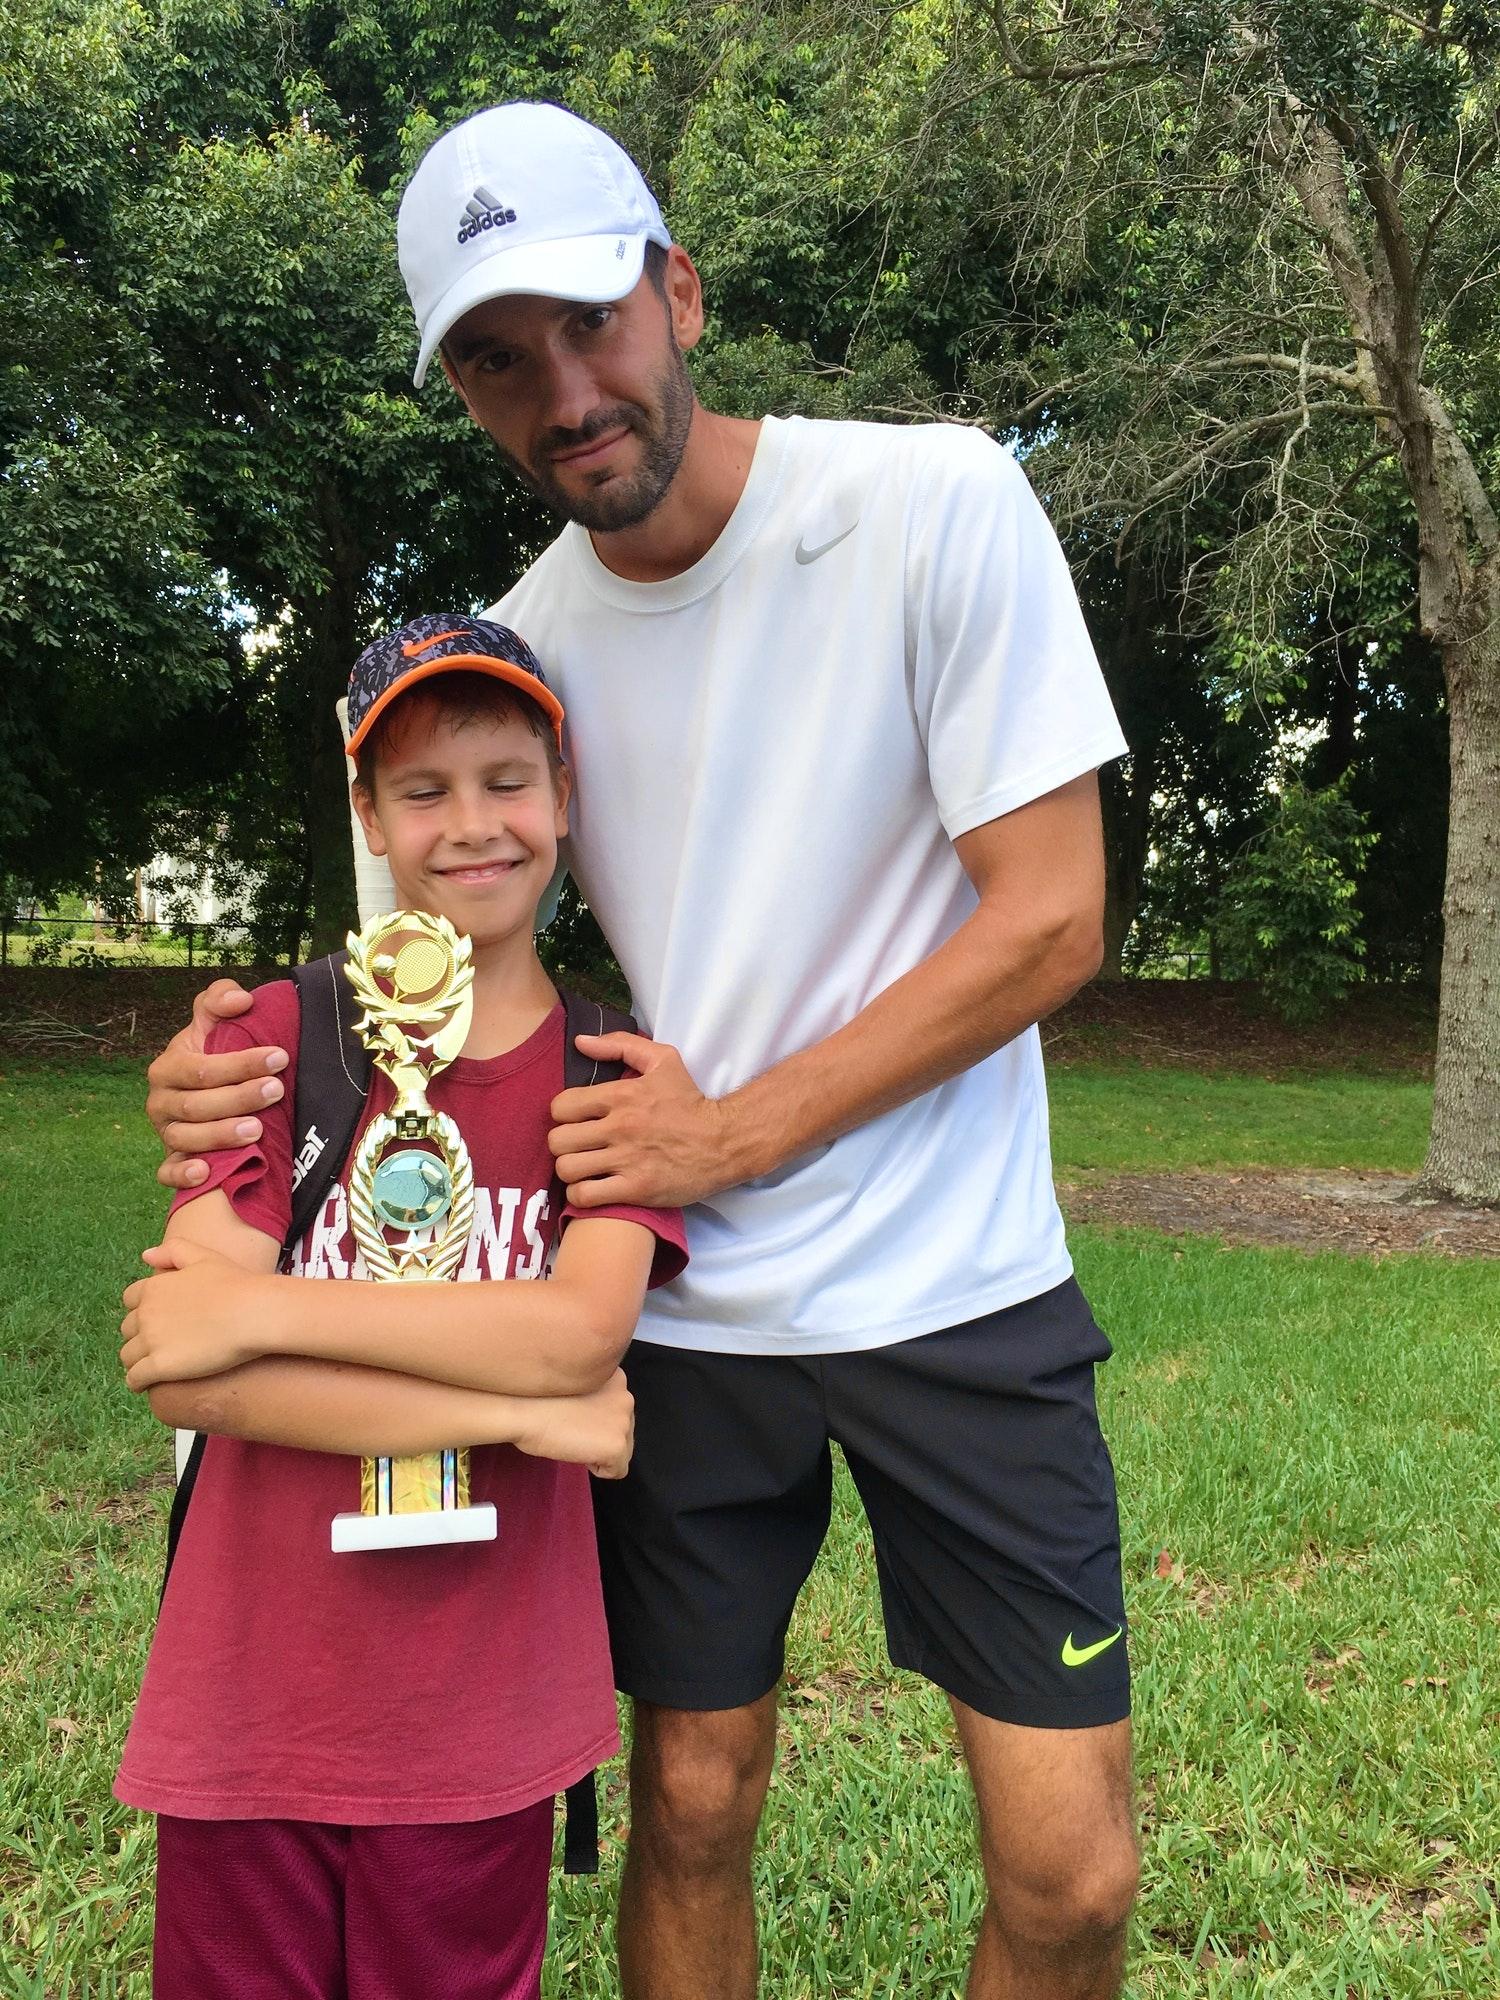 Oleksandr K. teaches tennis lessons in Sunny Isles Beach, FL